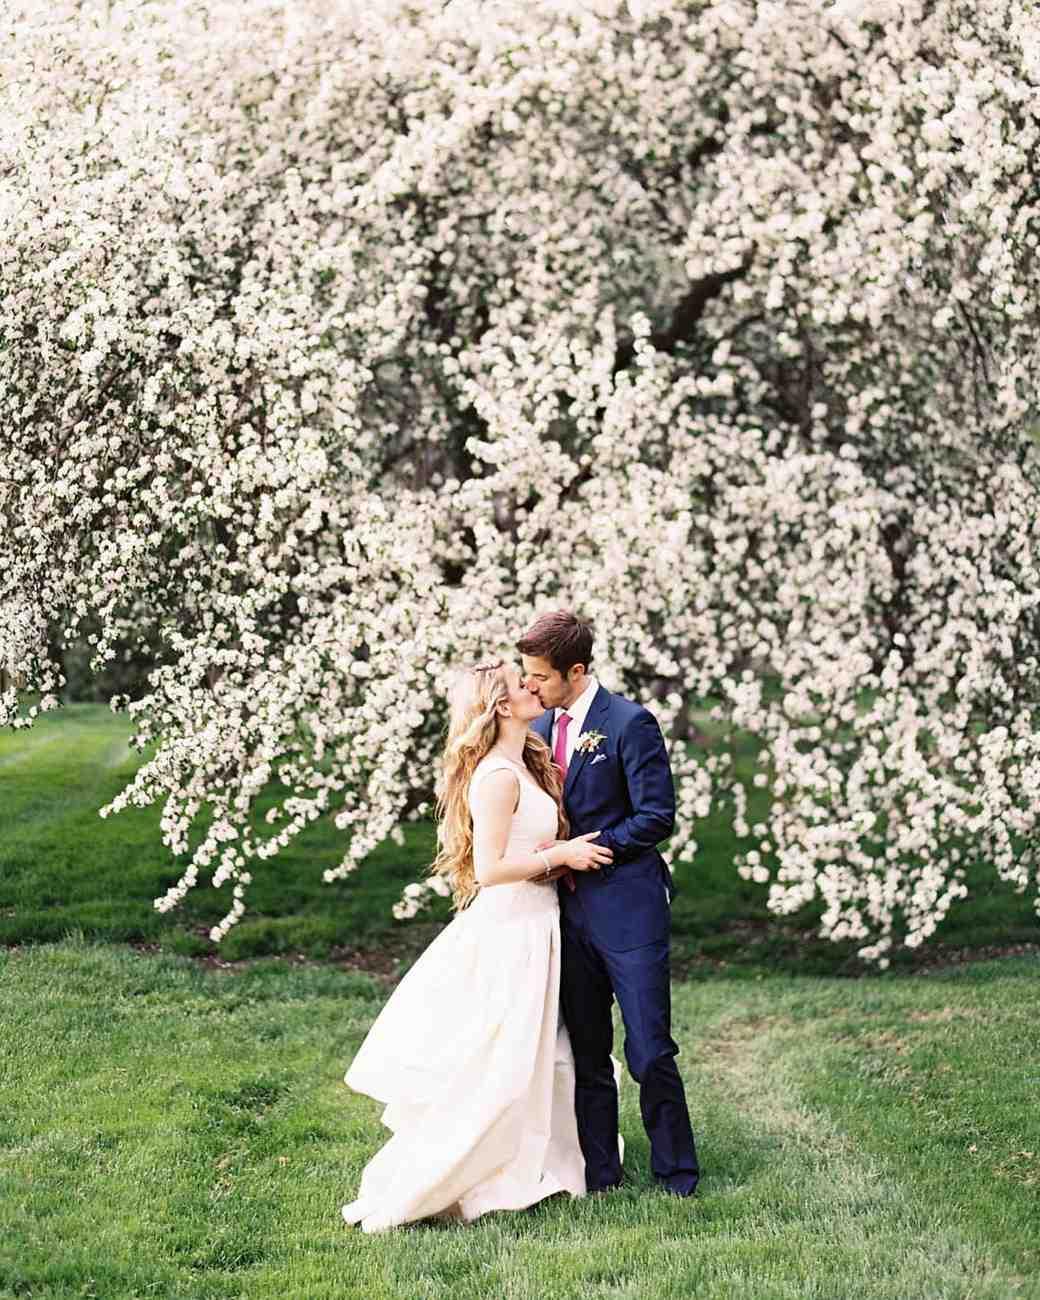 nikki-kiff-wedding-couple-004777004-s112766-0316.jpg